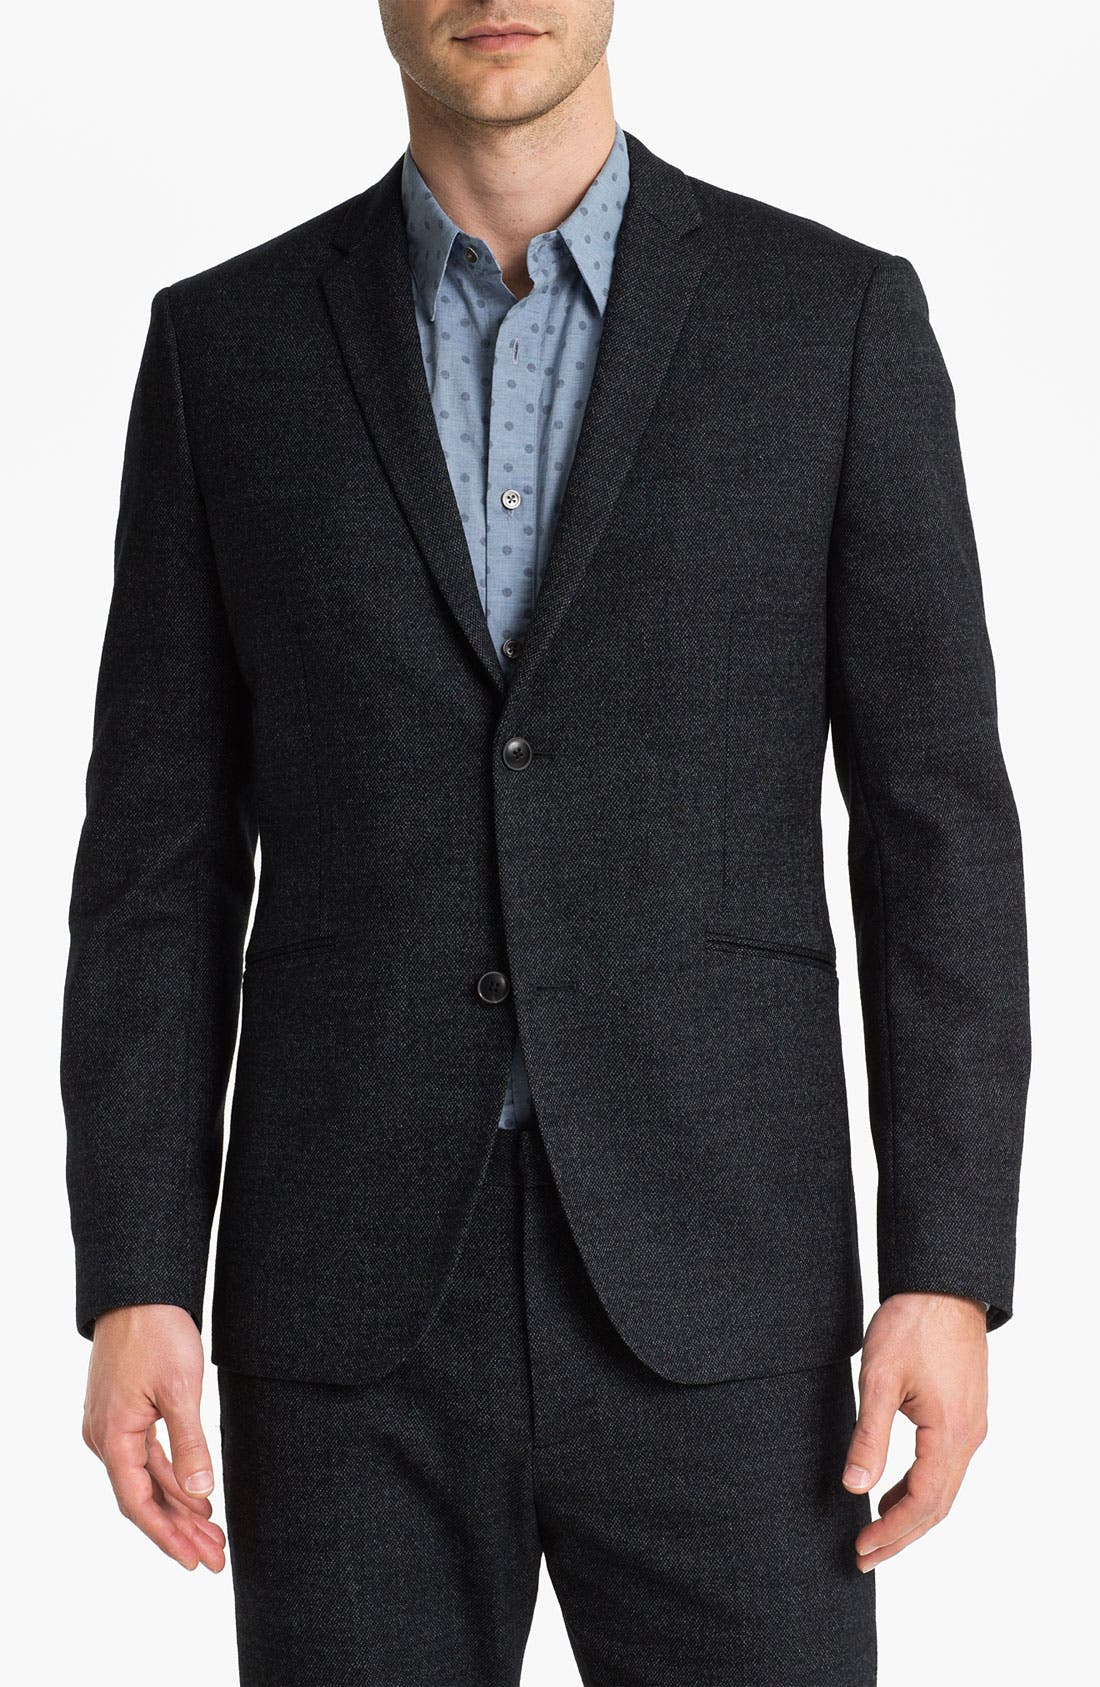 Alternate Image 1 Selected - Theory 'Rodolf Wolcott' Wool Blend Tweed Blazer